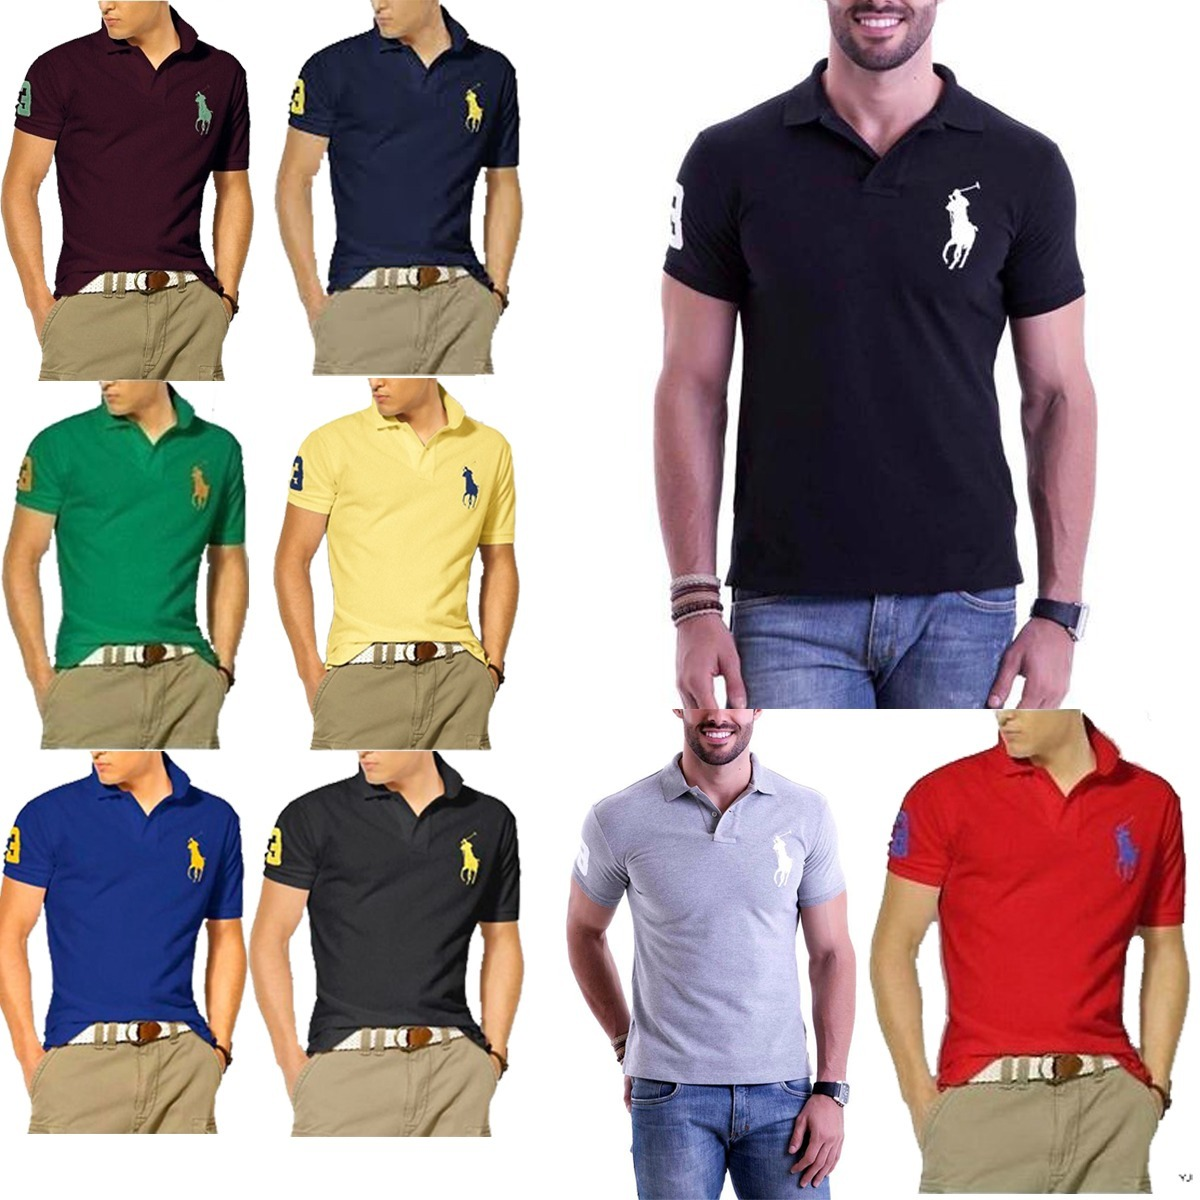 kit 6 camiseta camisa gola polo masculina revenda atacado! Carregando zoom. 1c045c92a3320